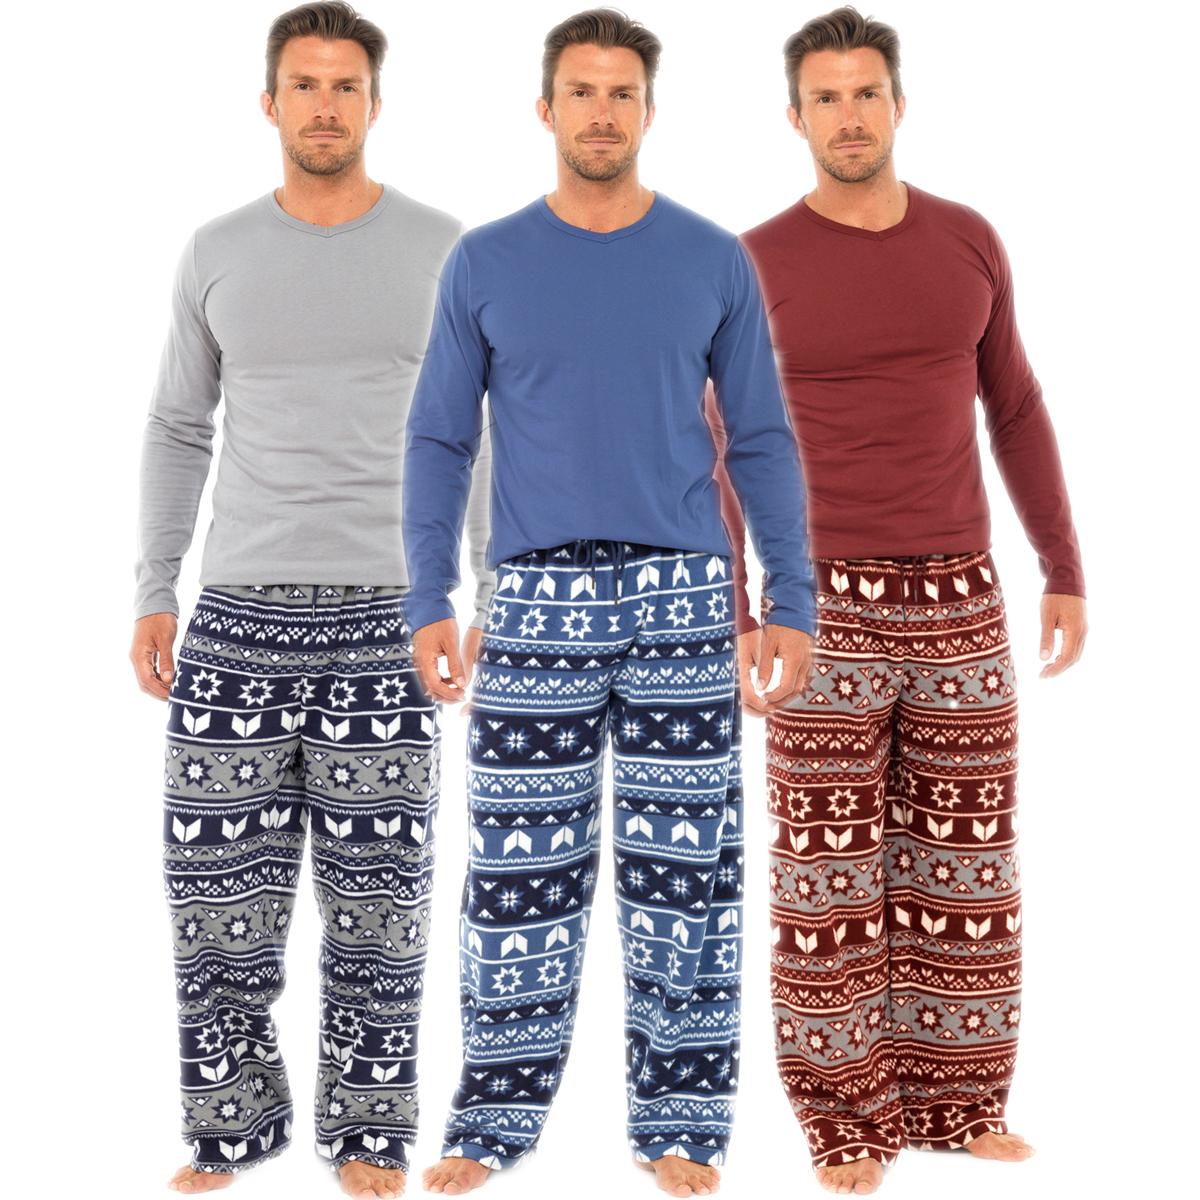 Mens Warm Fleece Winter PJ Pyjama Set Night Wear PJ's Pyjamas ...